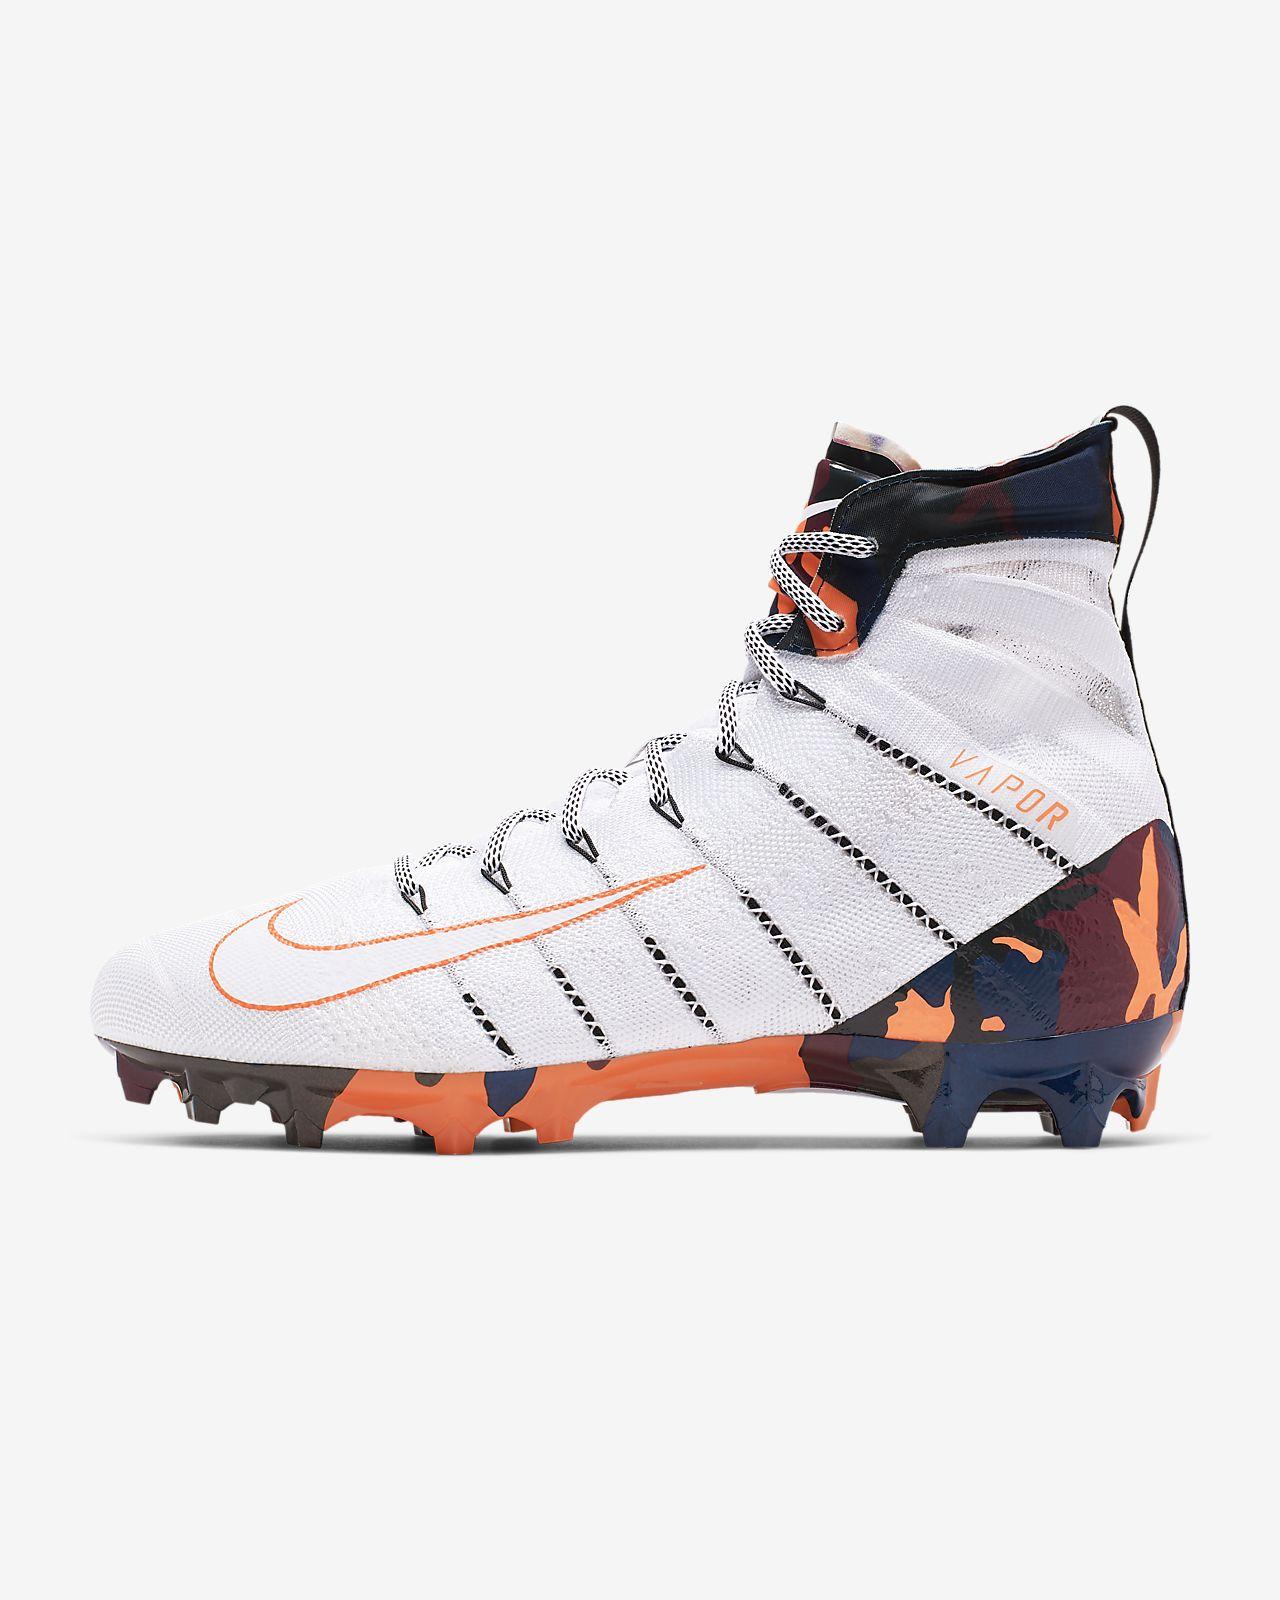 Nike Vapor Untouchable 3 Elite Men\u0027s Football Cleat